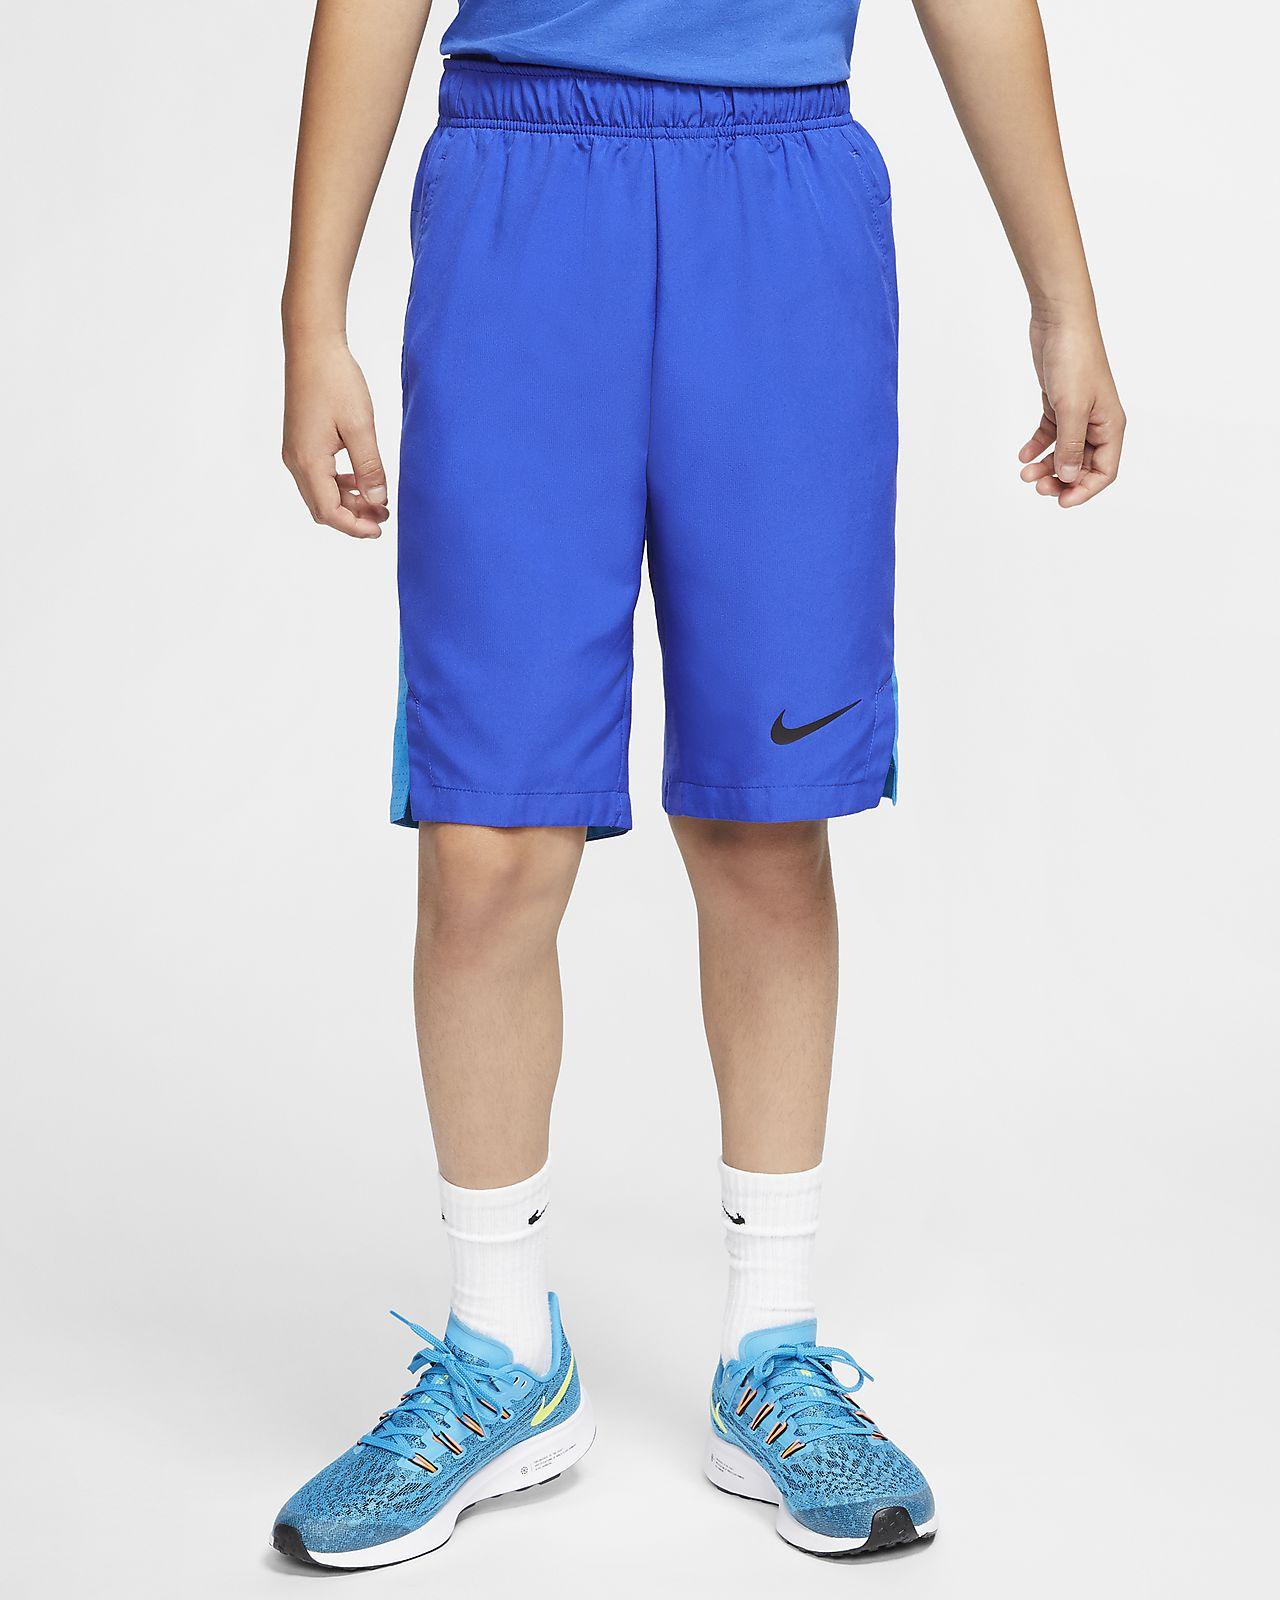 Nike Older Kids' (Boys') Woven Training Shorts